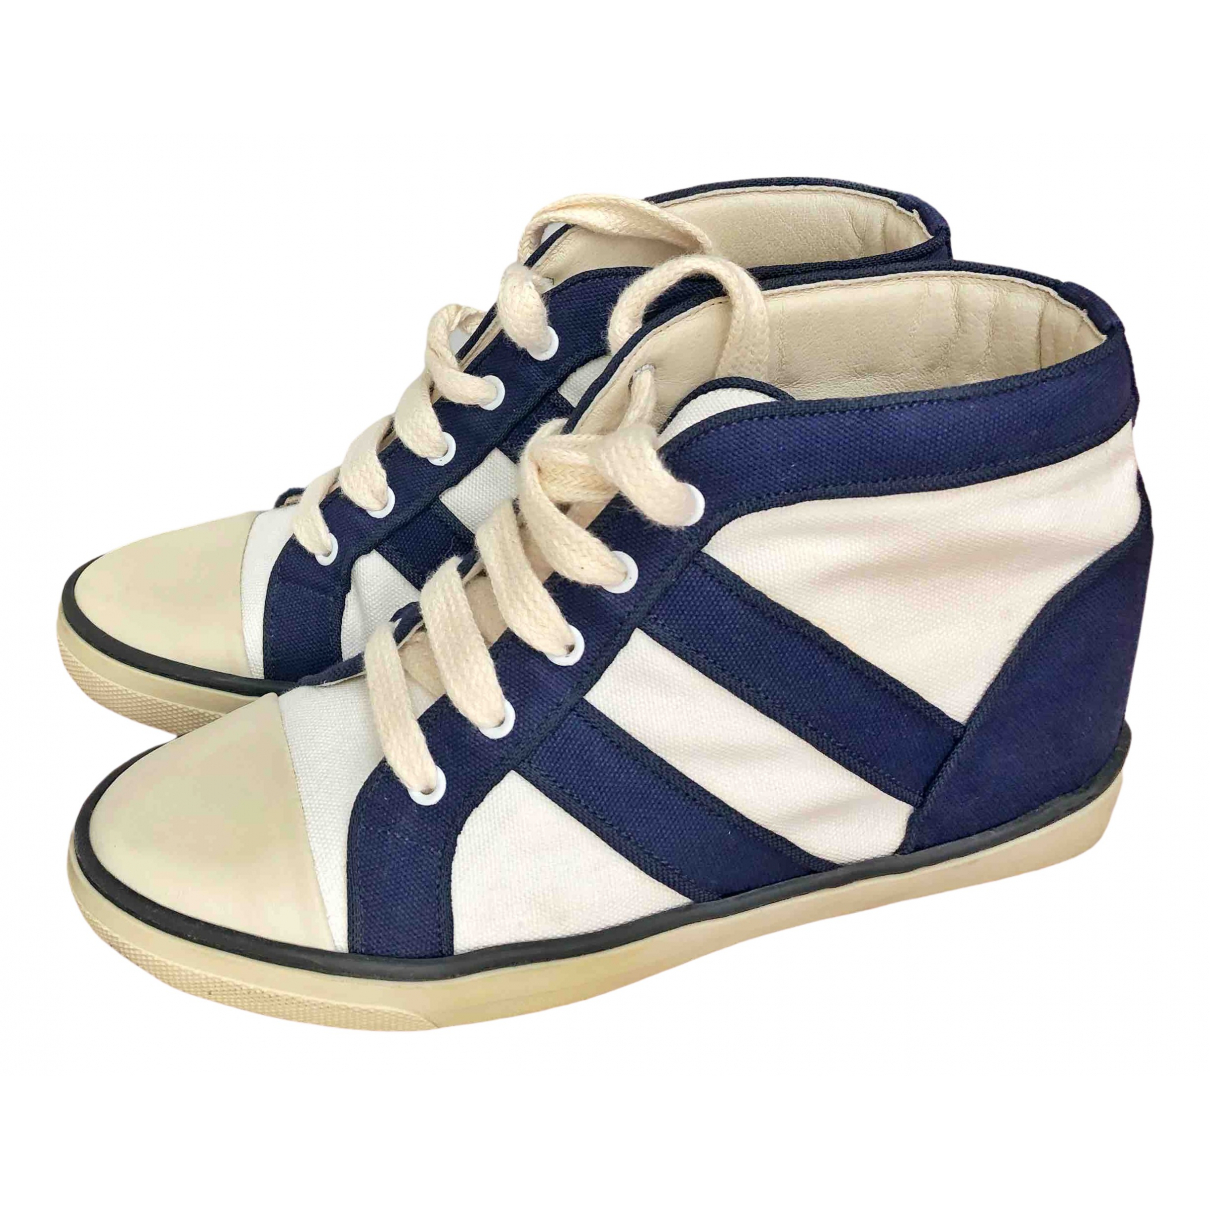 Isabel Marant \N Sneakers in  Weiss Leinen